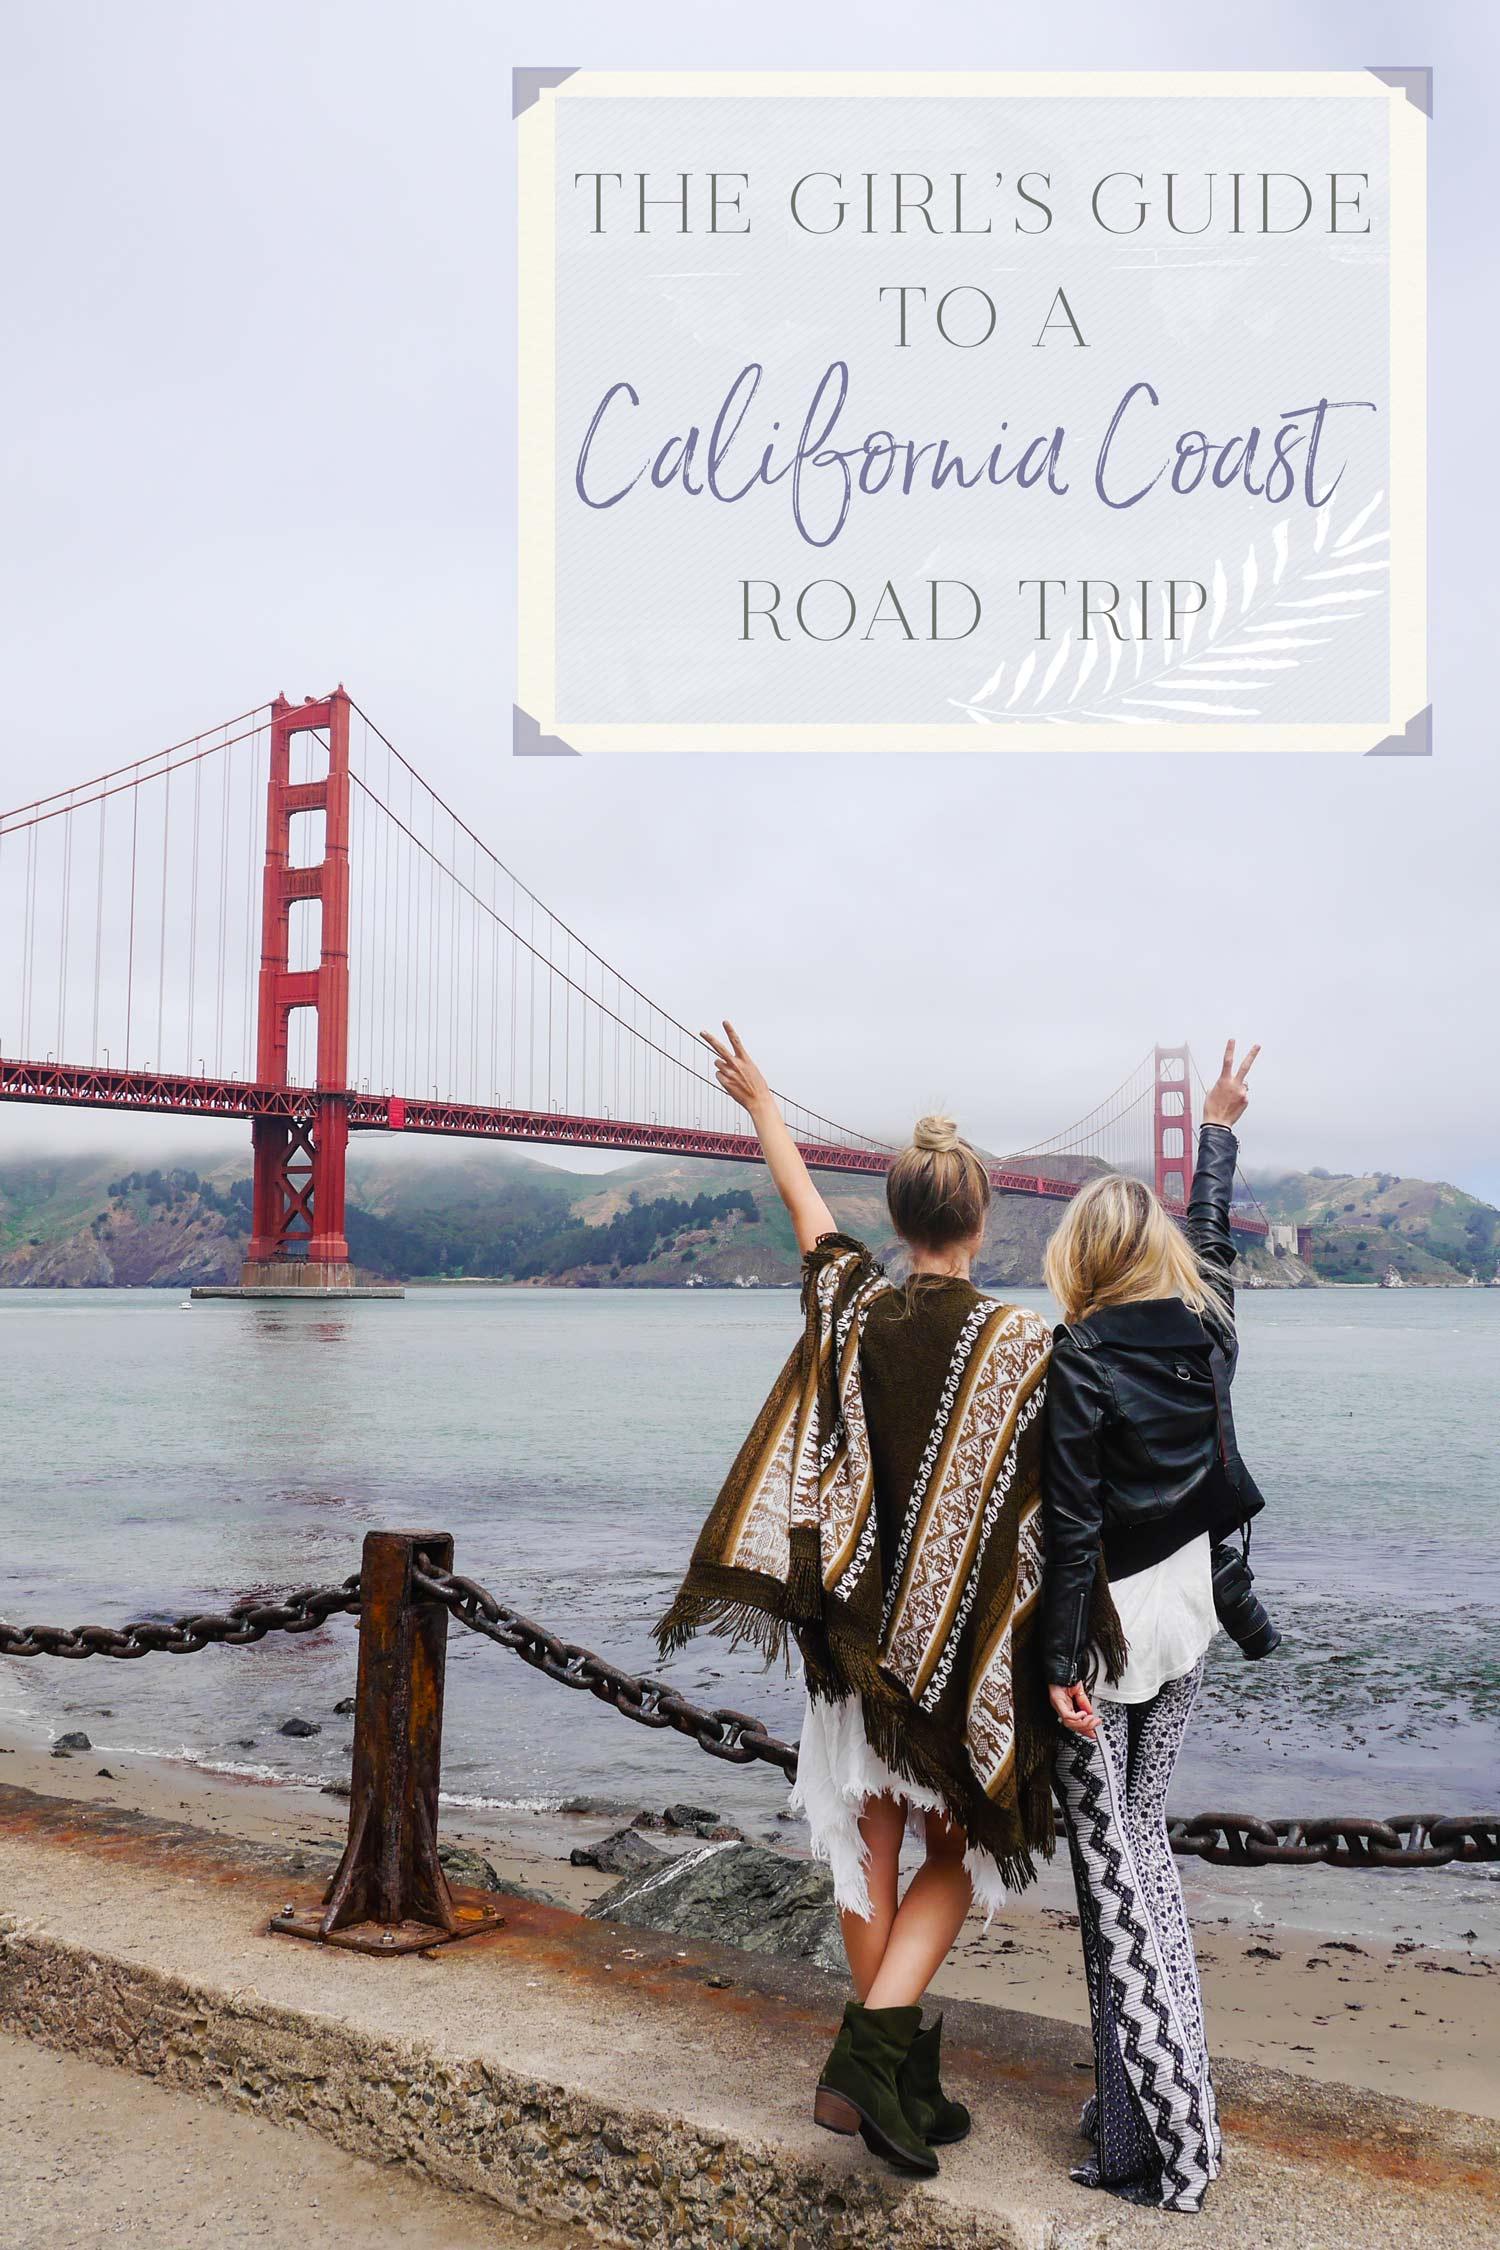 Girls Guide to a California Coast Road Trip